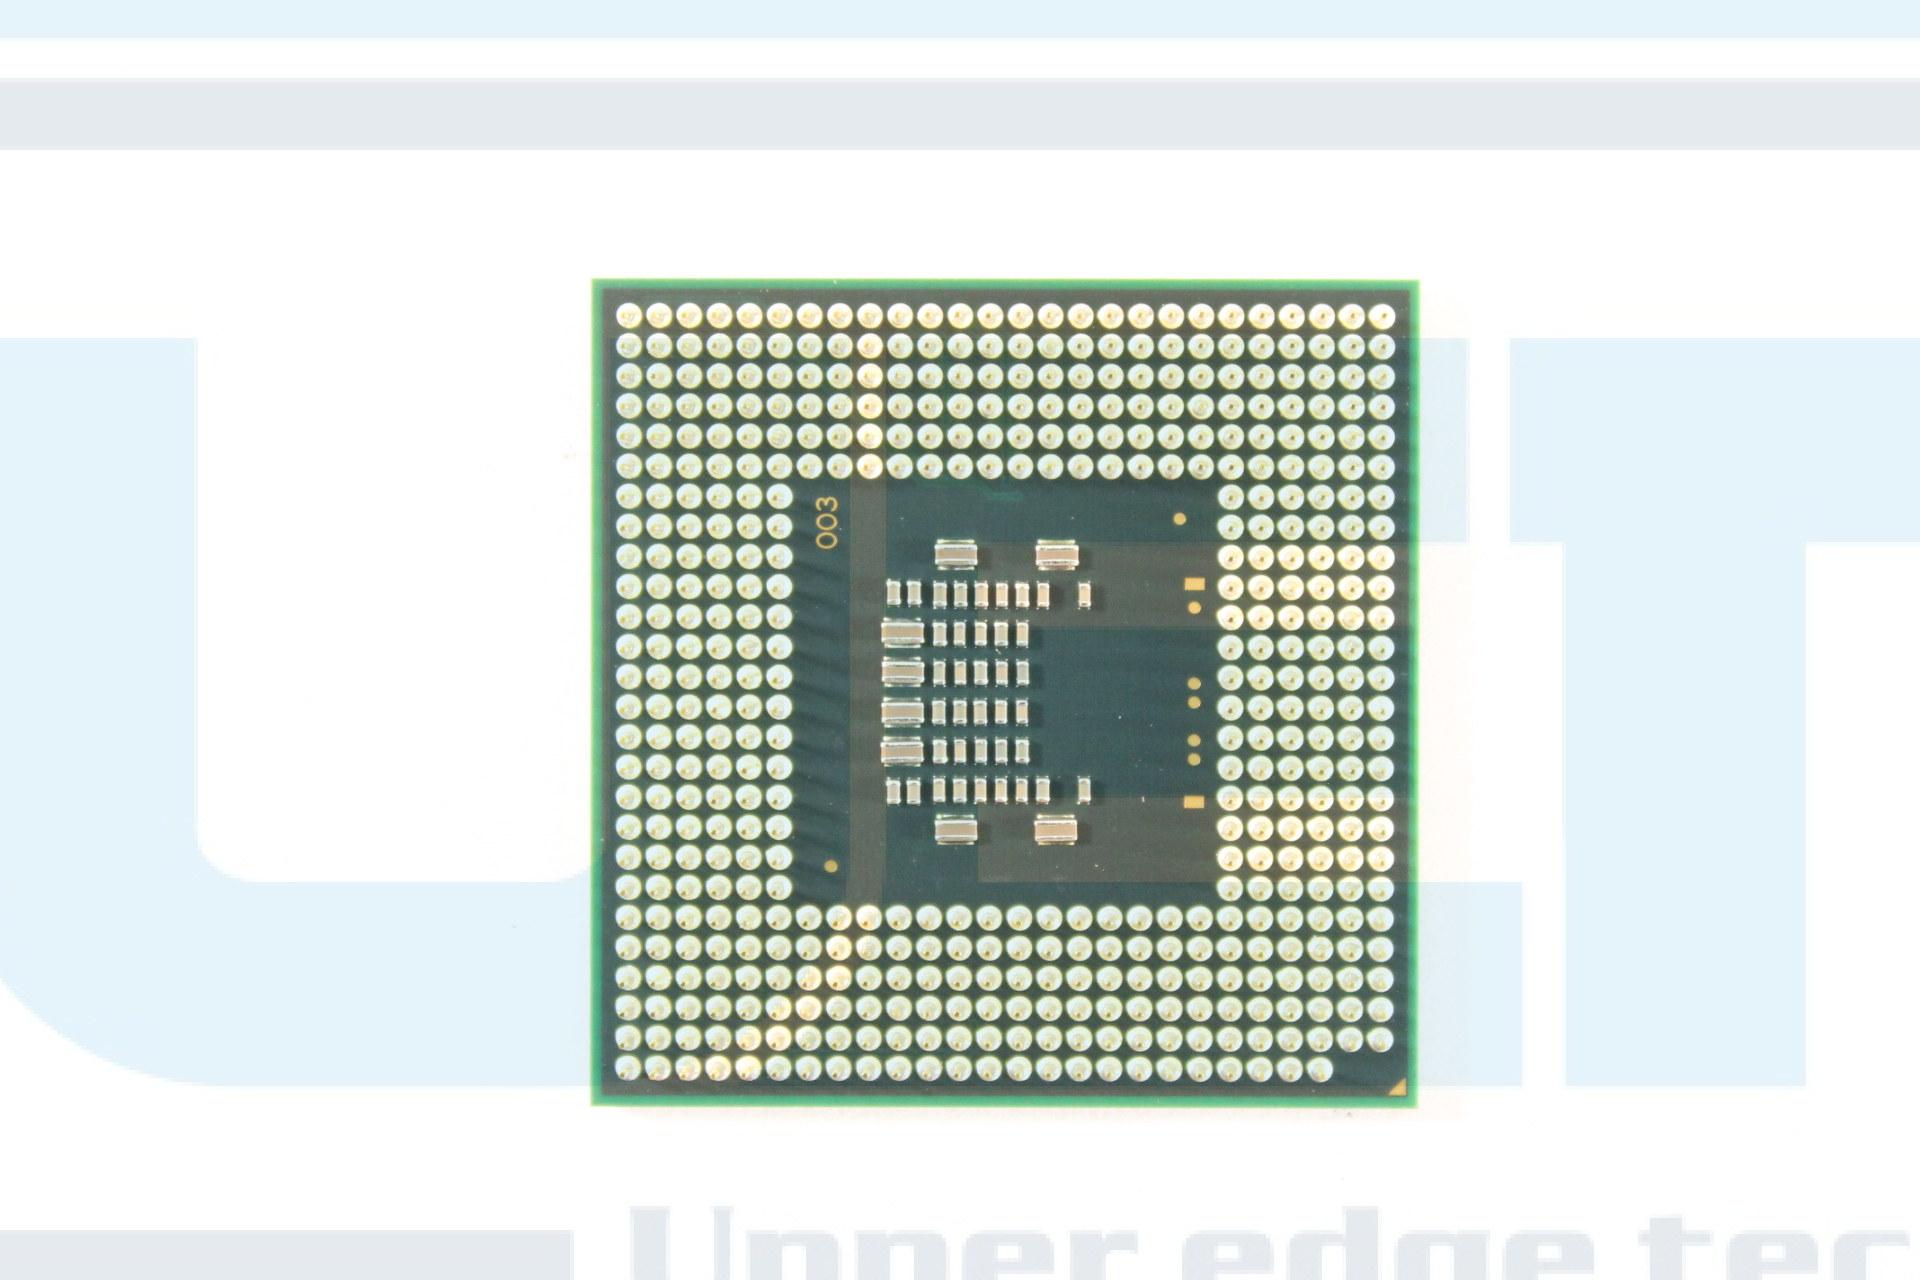 Intel Core2 Duo CPU T7100 @ 1.80GHz